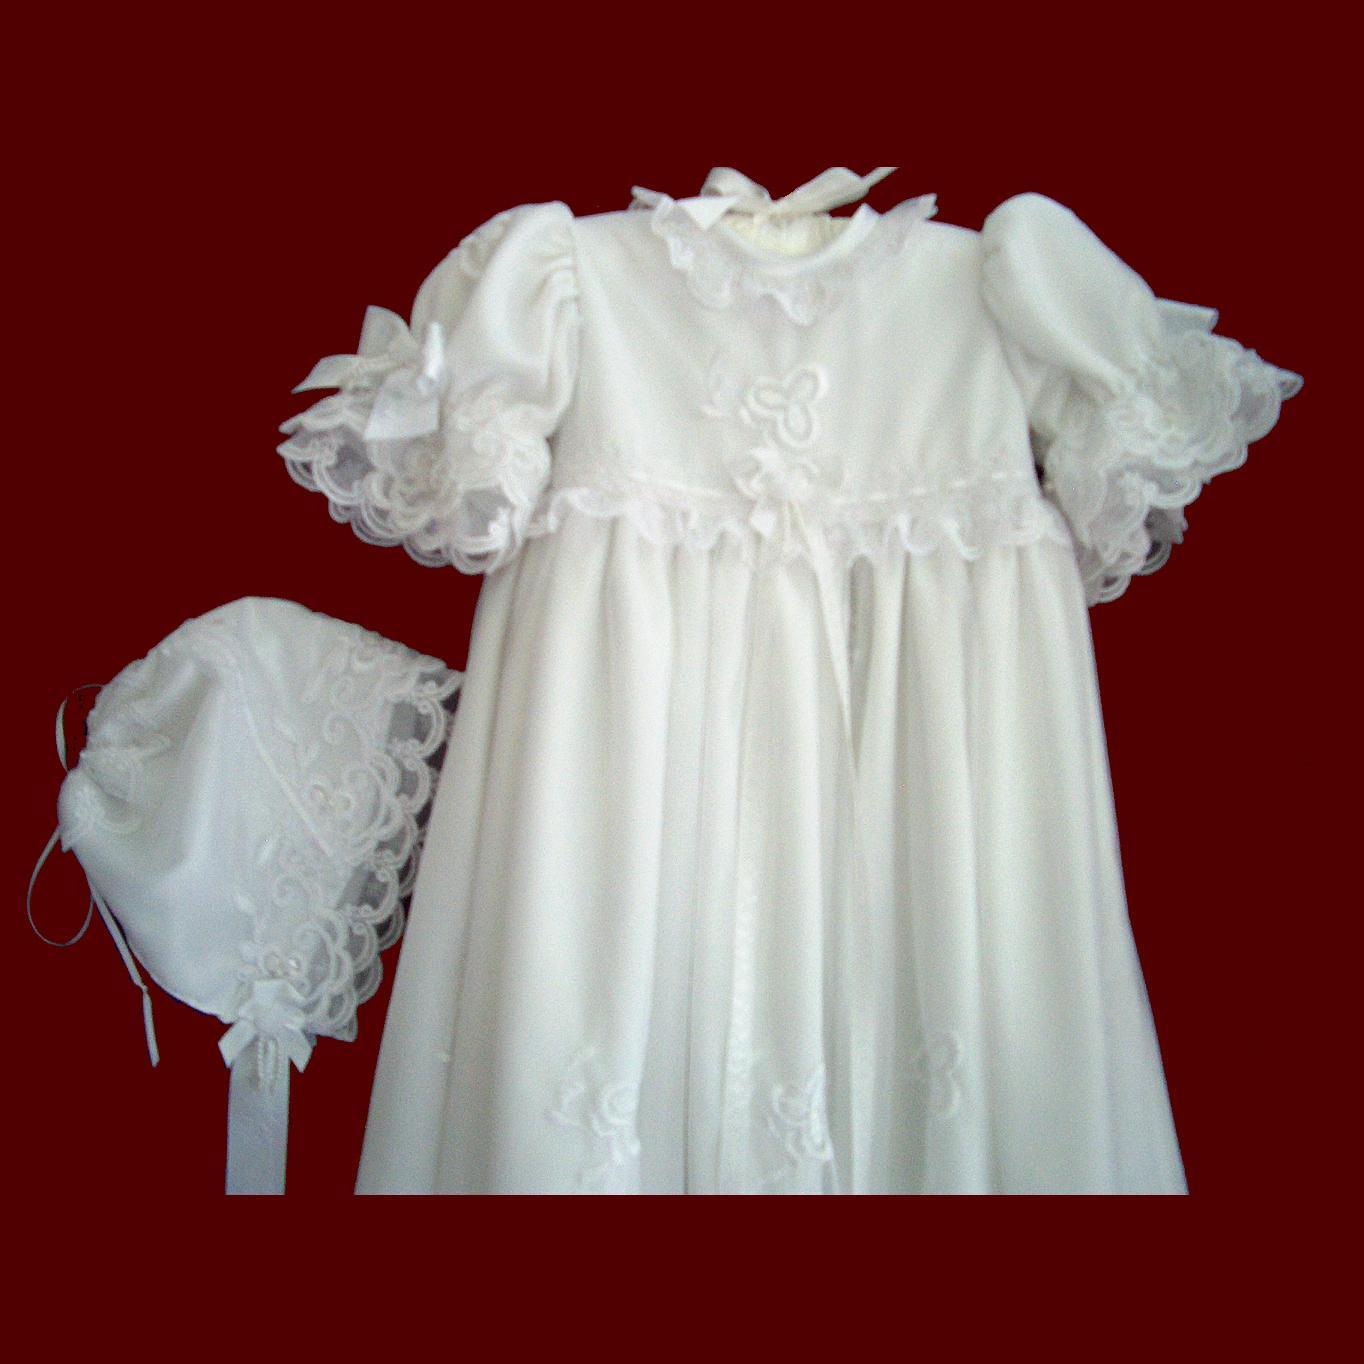 Beaded And Embroidered Netting Girls Designer Christening